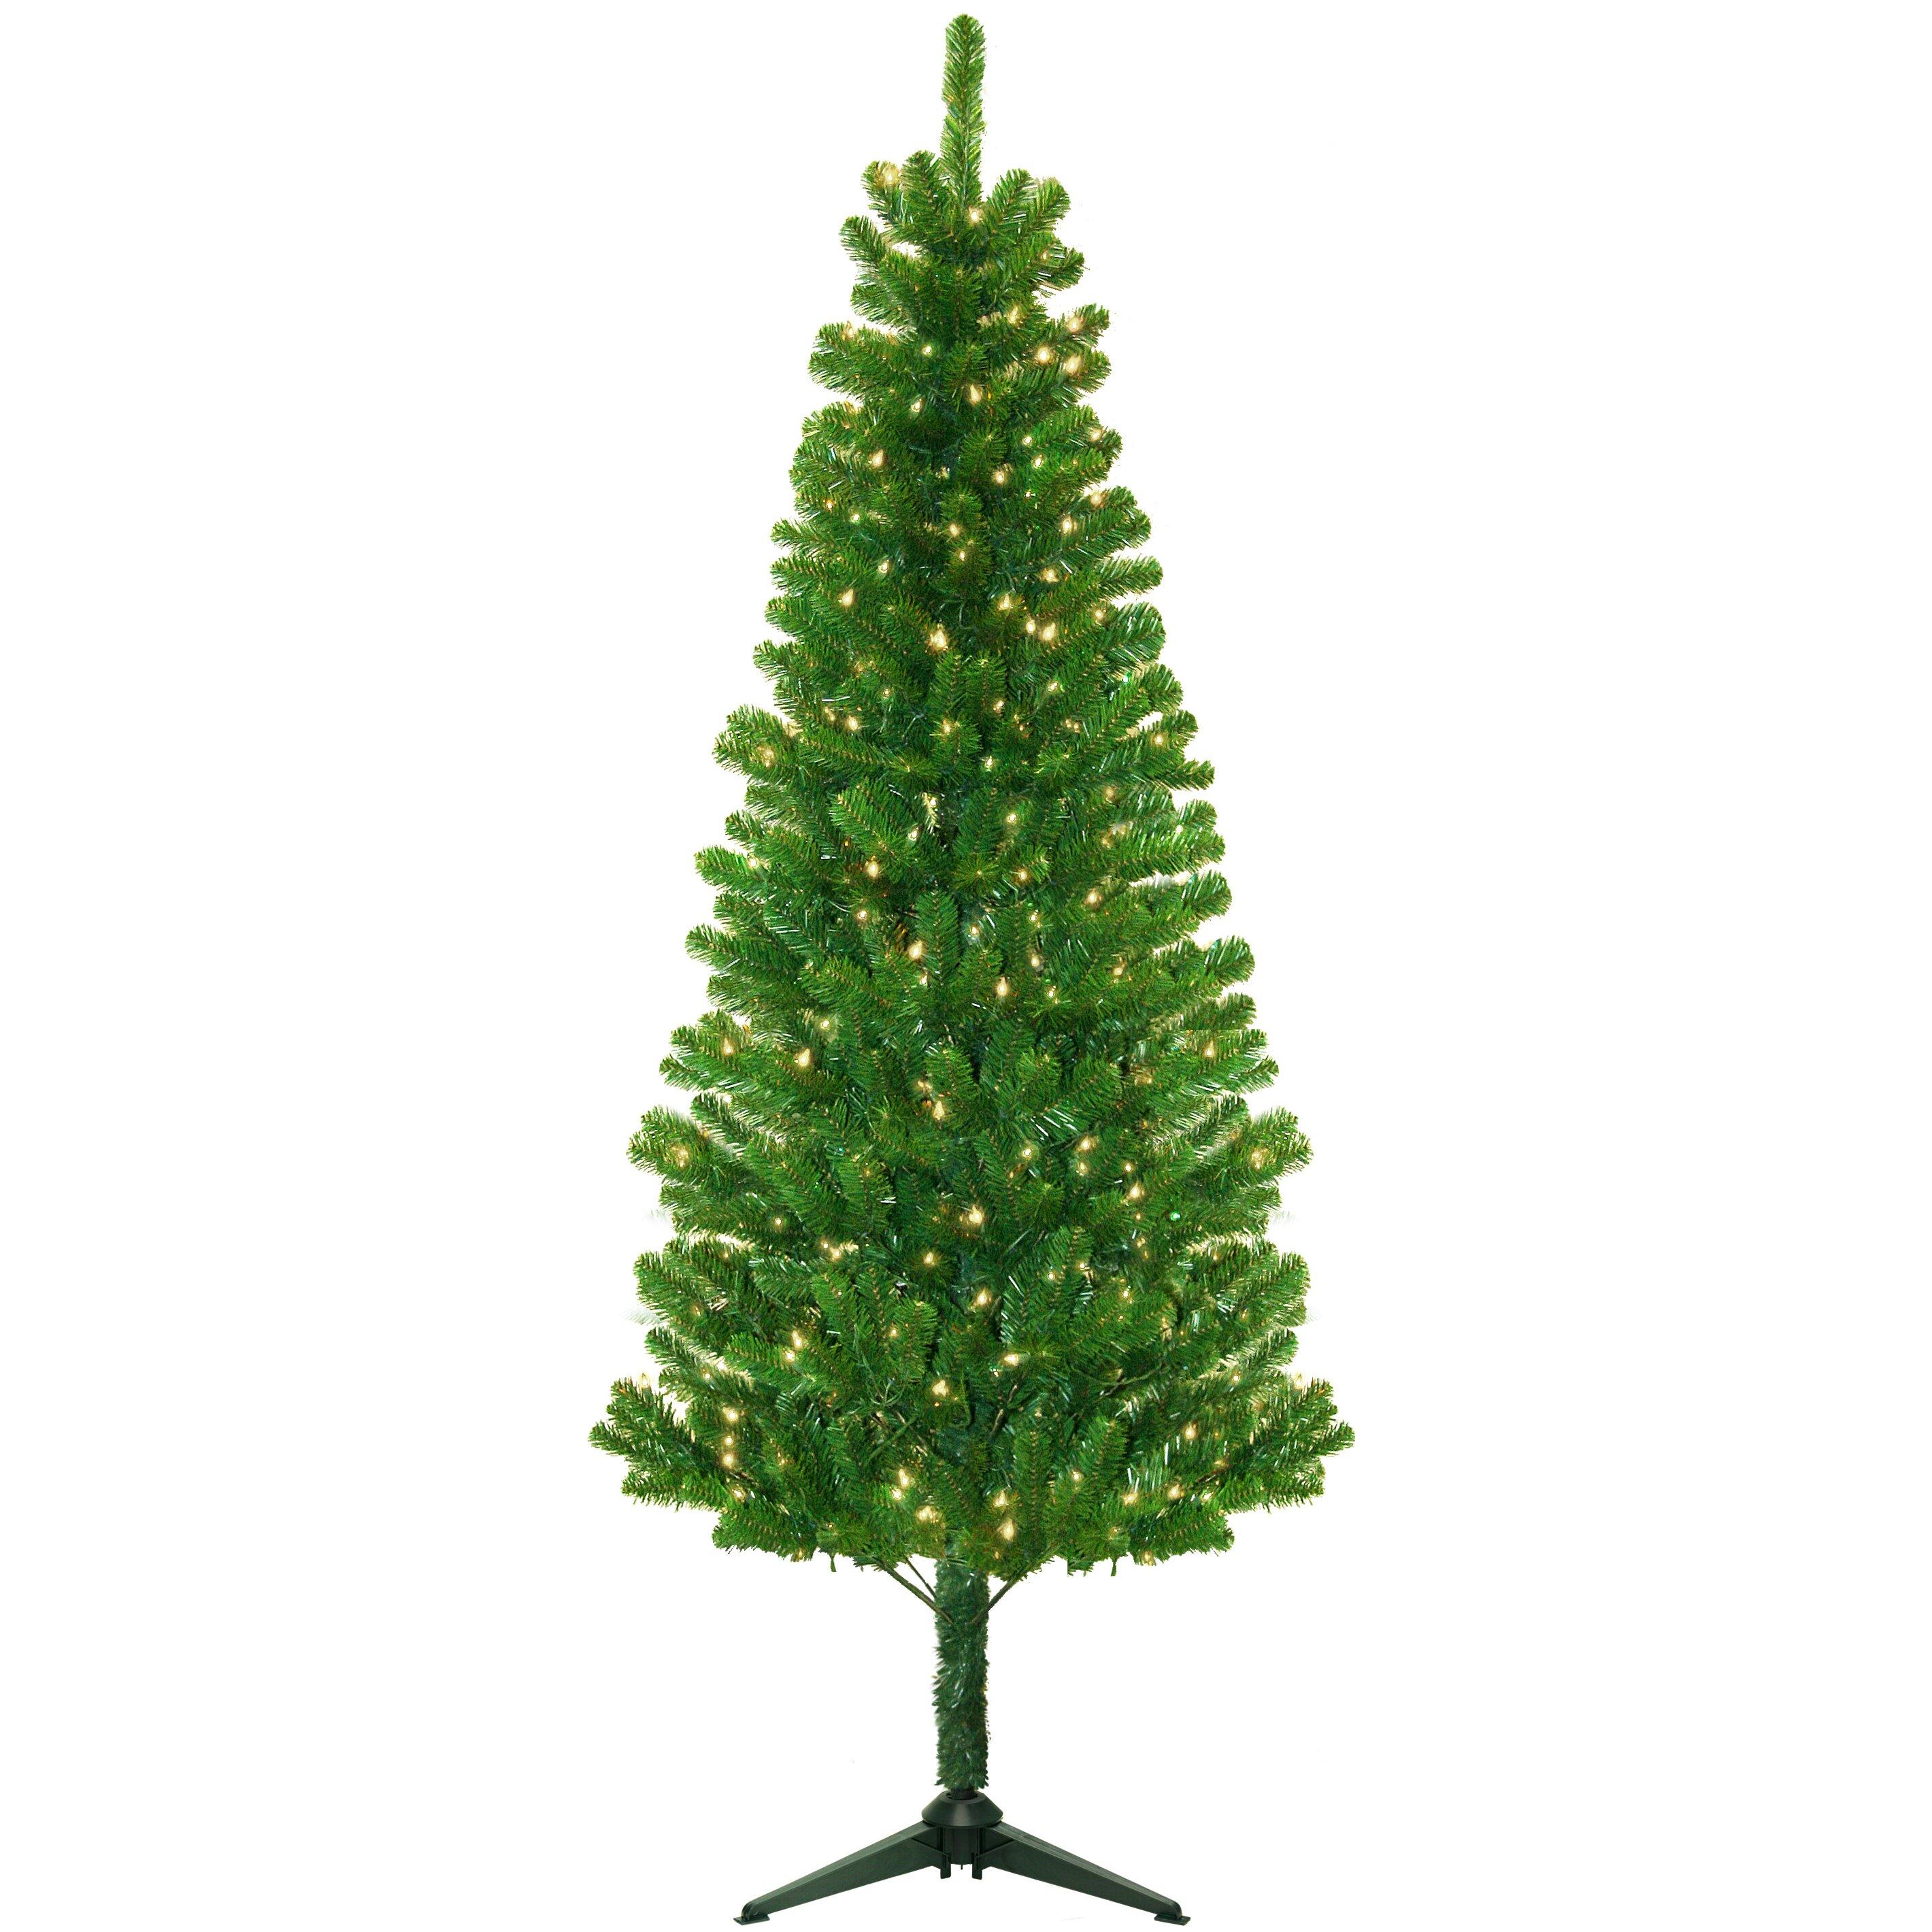 General Foam Plastics 6' Morrison Christmas Tree With 200